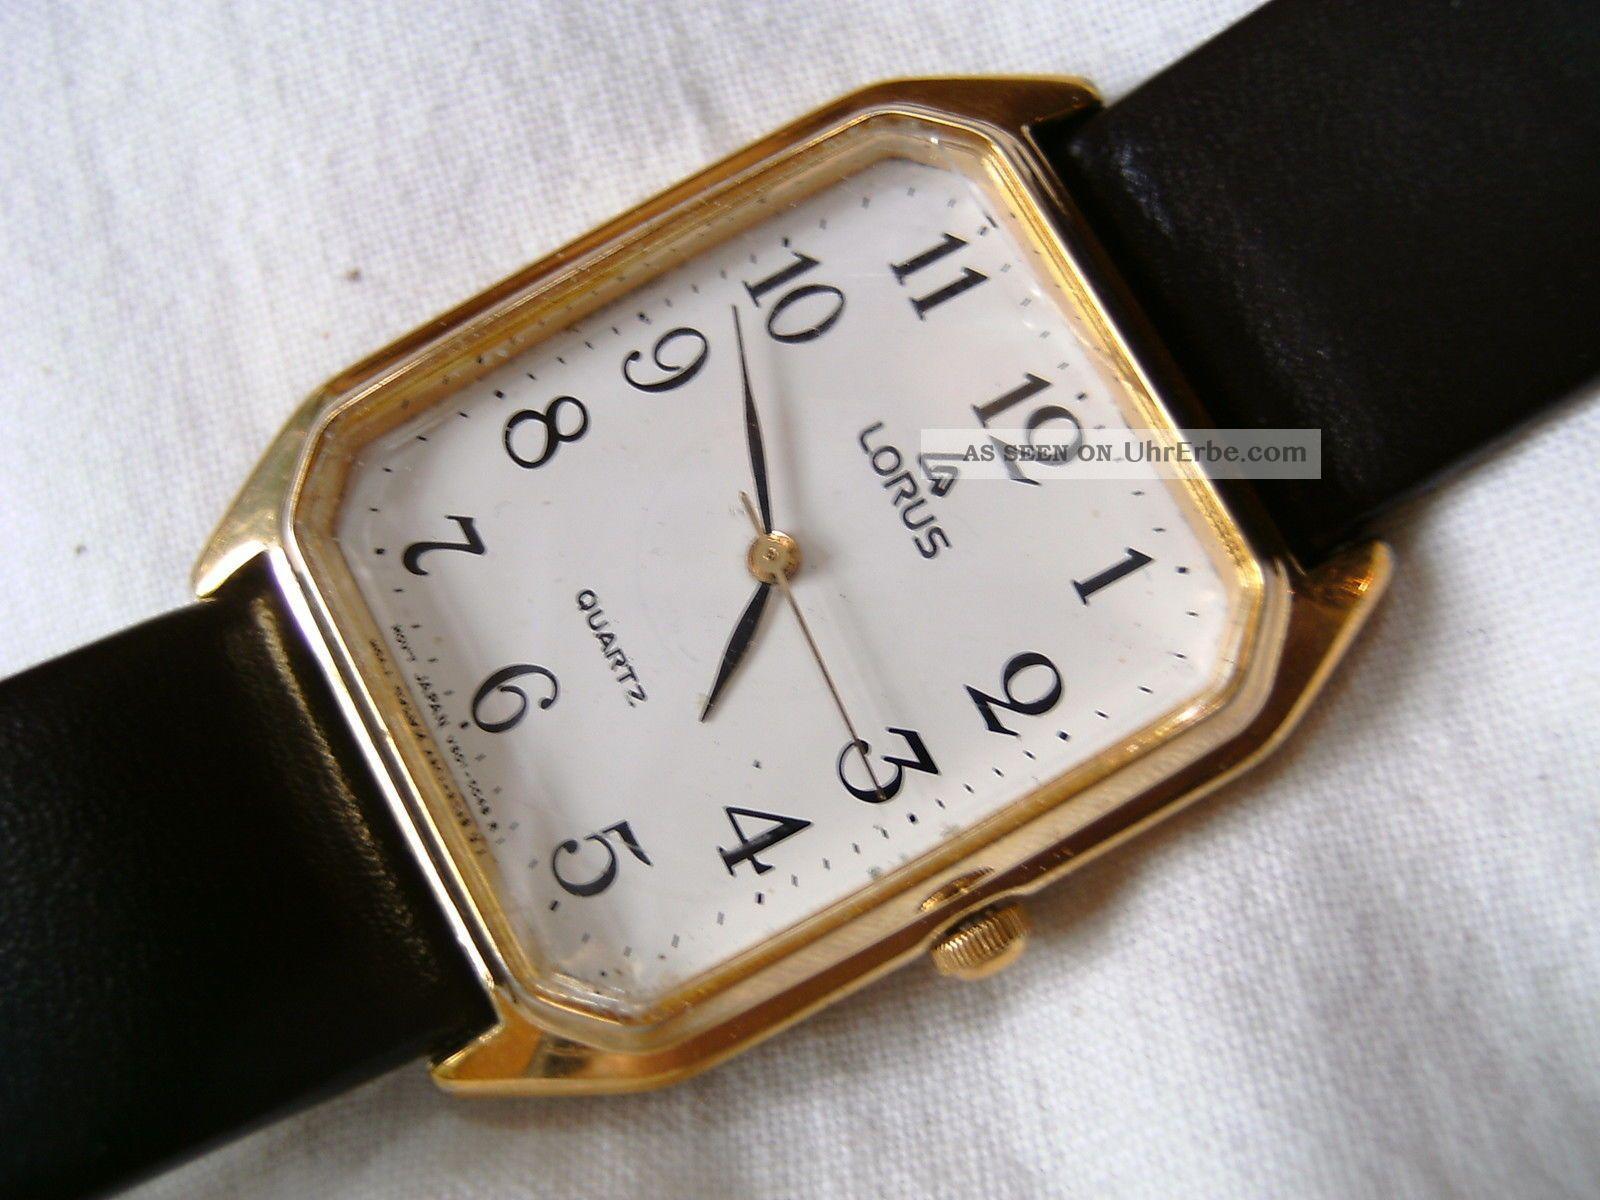 Lorus Herren Armband Uhr Quartz Japan Movt Armbanduhren Bild